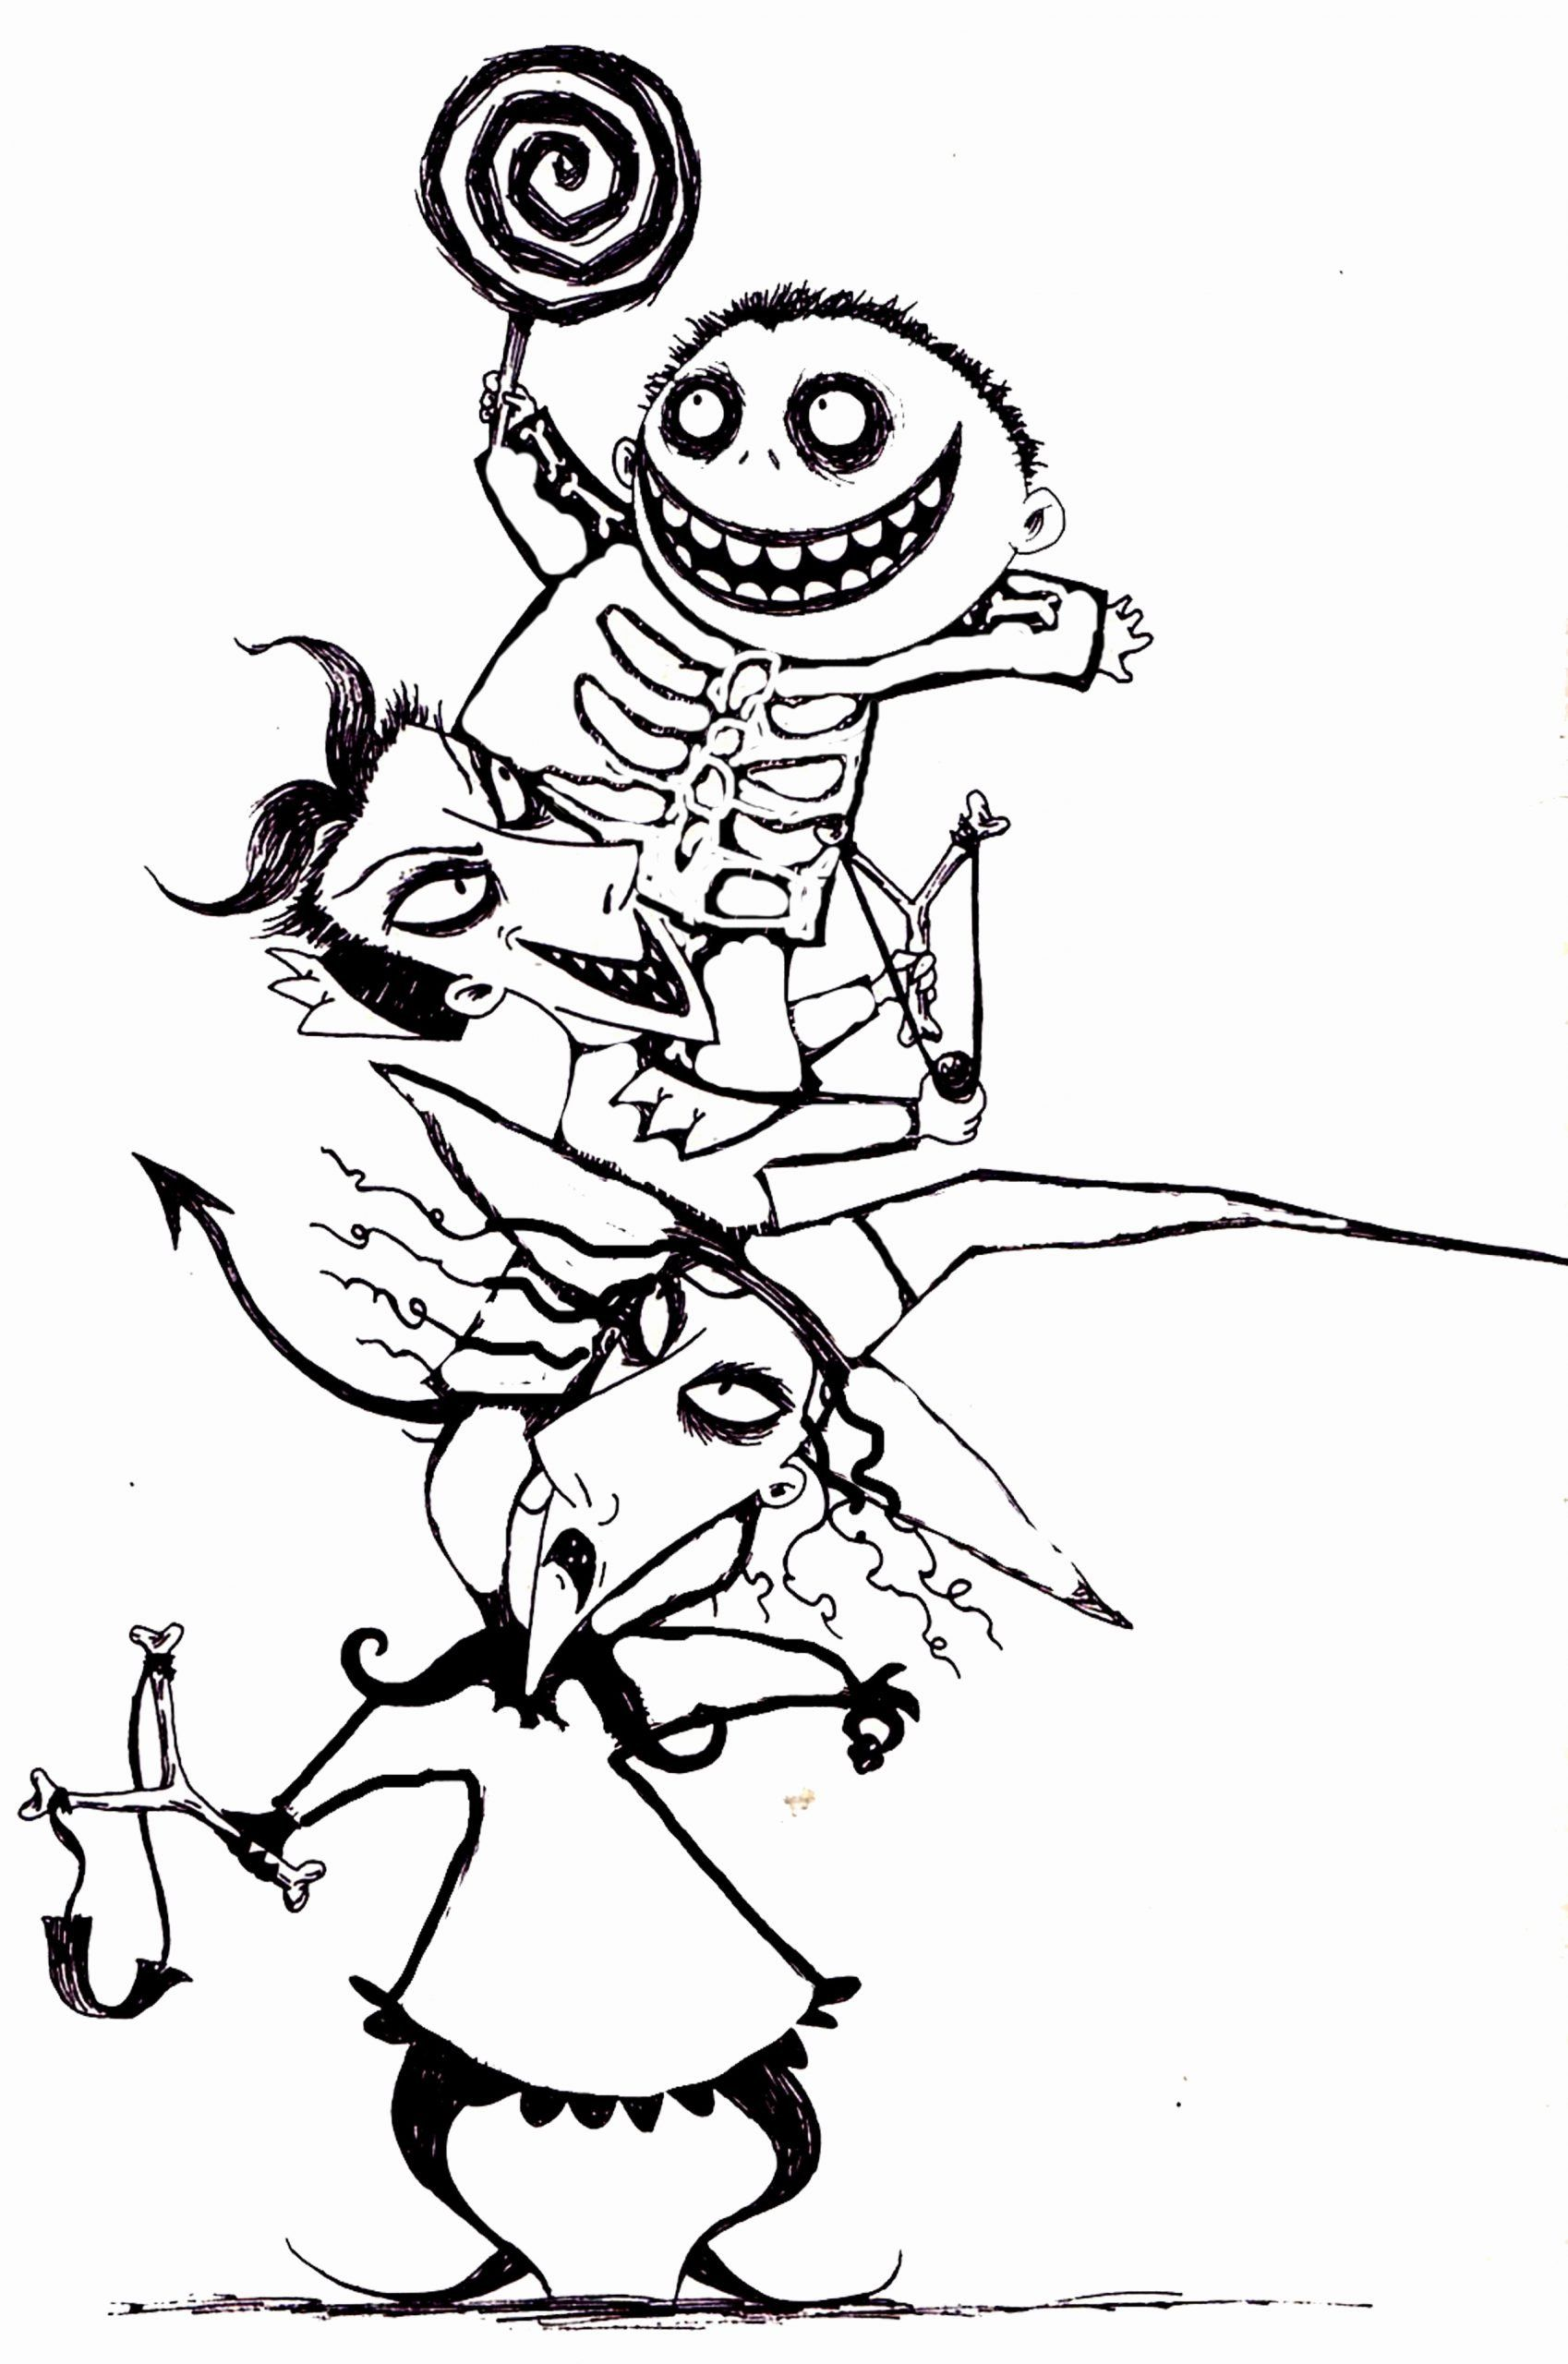 Jack Skellington Coloring Page Lovely Free Printabl In 2020 Nightmare Before Christmas Tattoo Nightmare Before Christmas Characters Nightmare Before Christmas Drawings